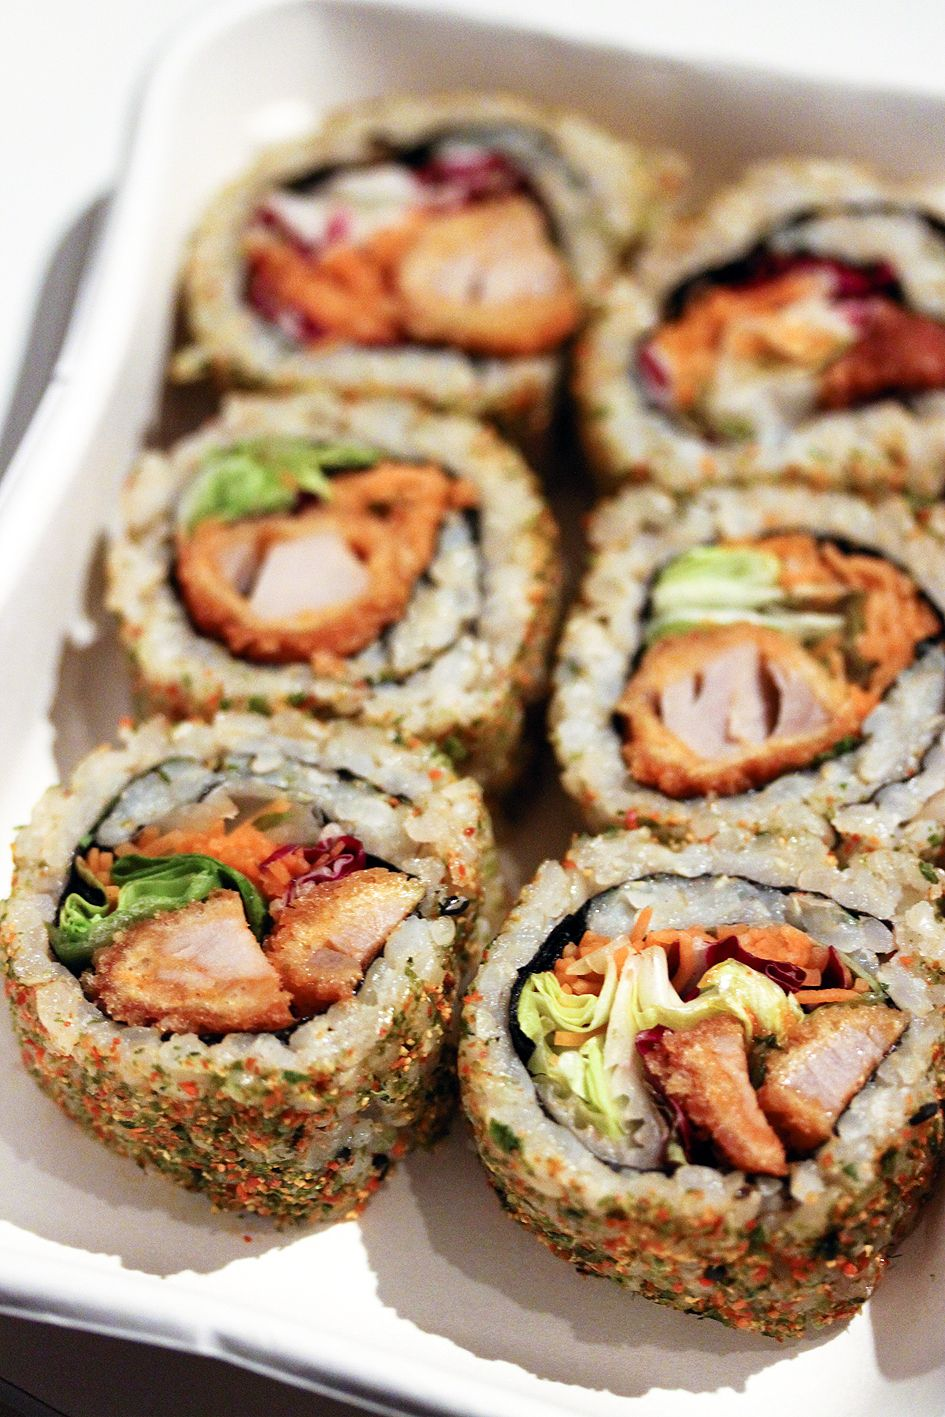 Spicy Tuna Tempura Maki – Link leads to spicy tuna rolls.  For Tuna Tempura recipe inside the rolls –